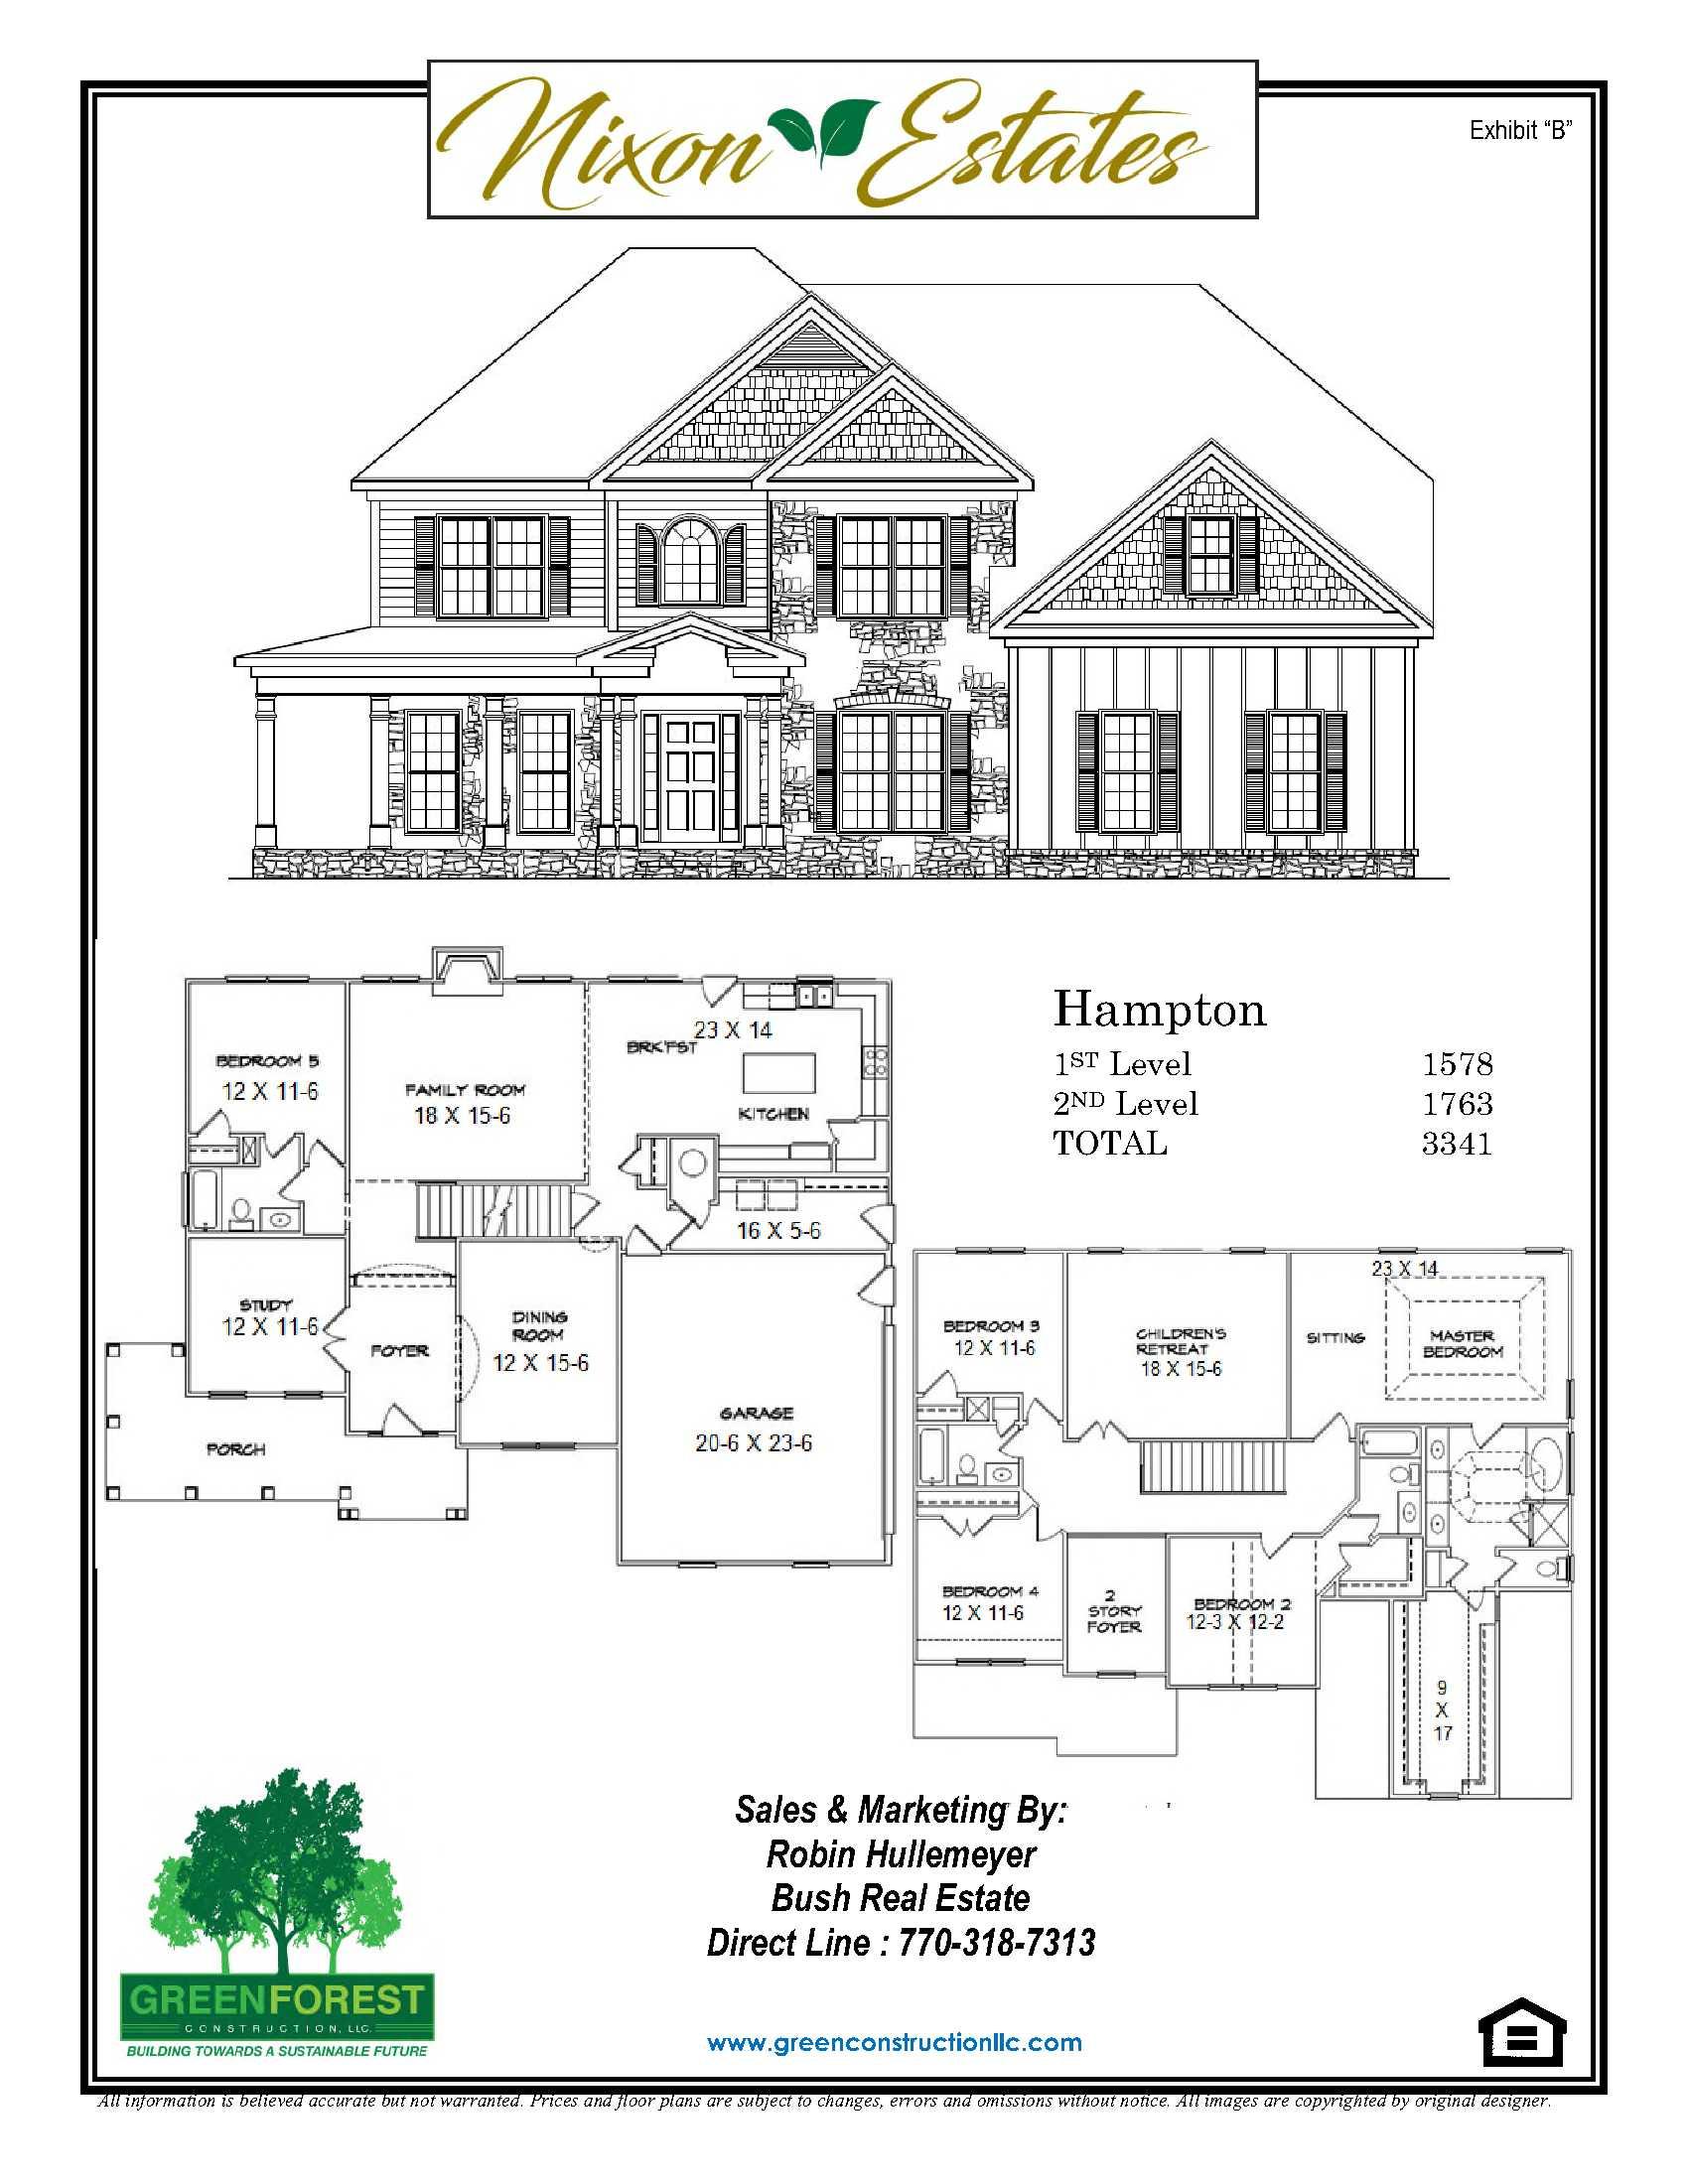 03.13.17 - Nixon Estates Full Package_6.jpg